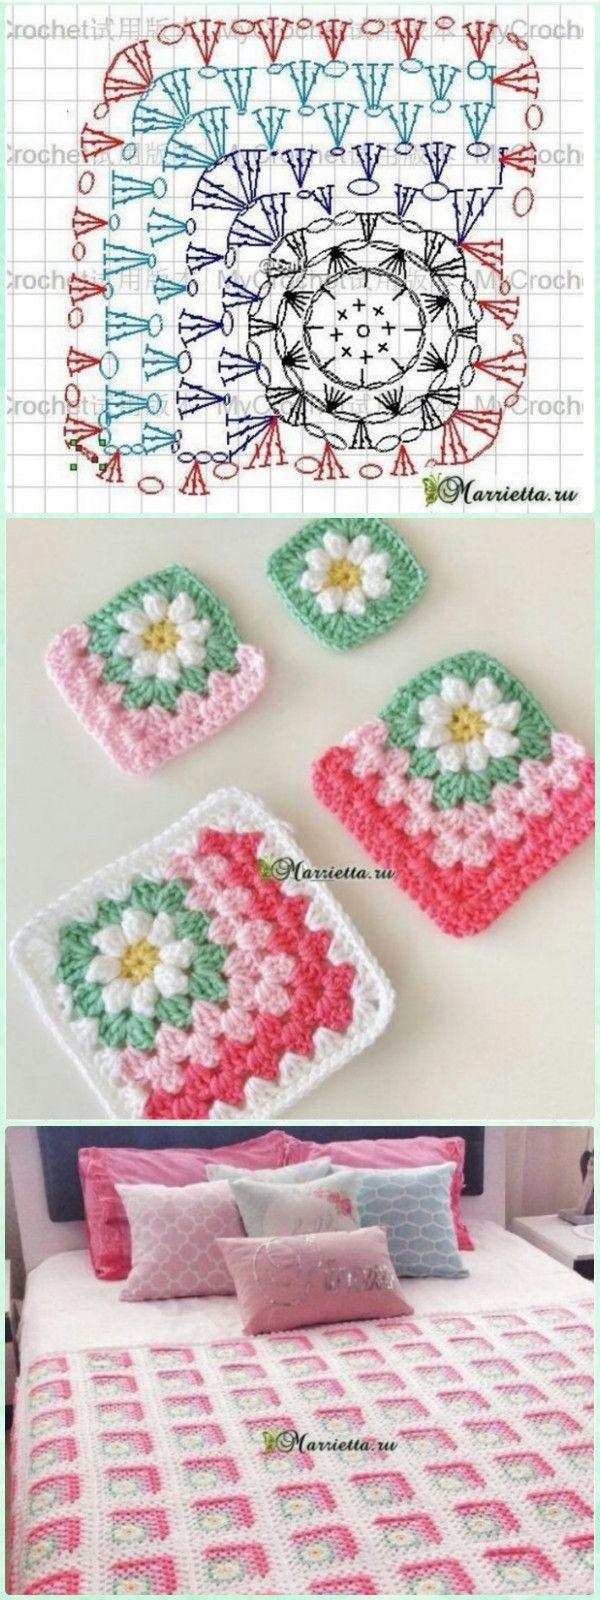 Perfecto Mejores Sitios Patrón De Crochet Libre Viñeta - Ideas de ...